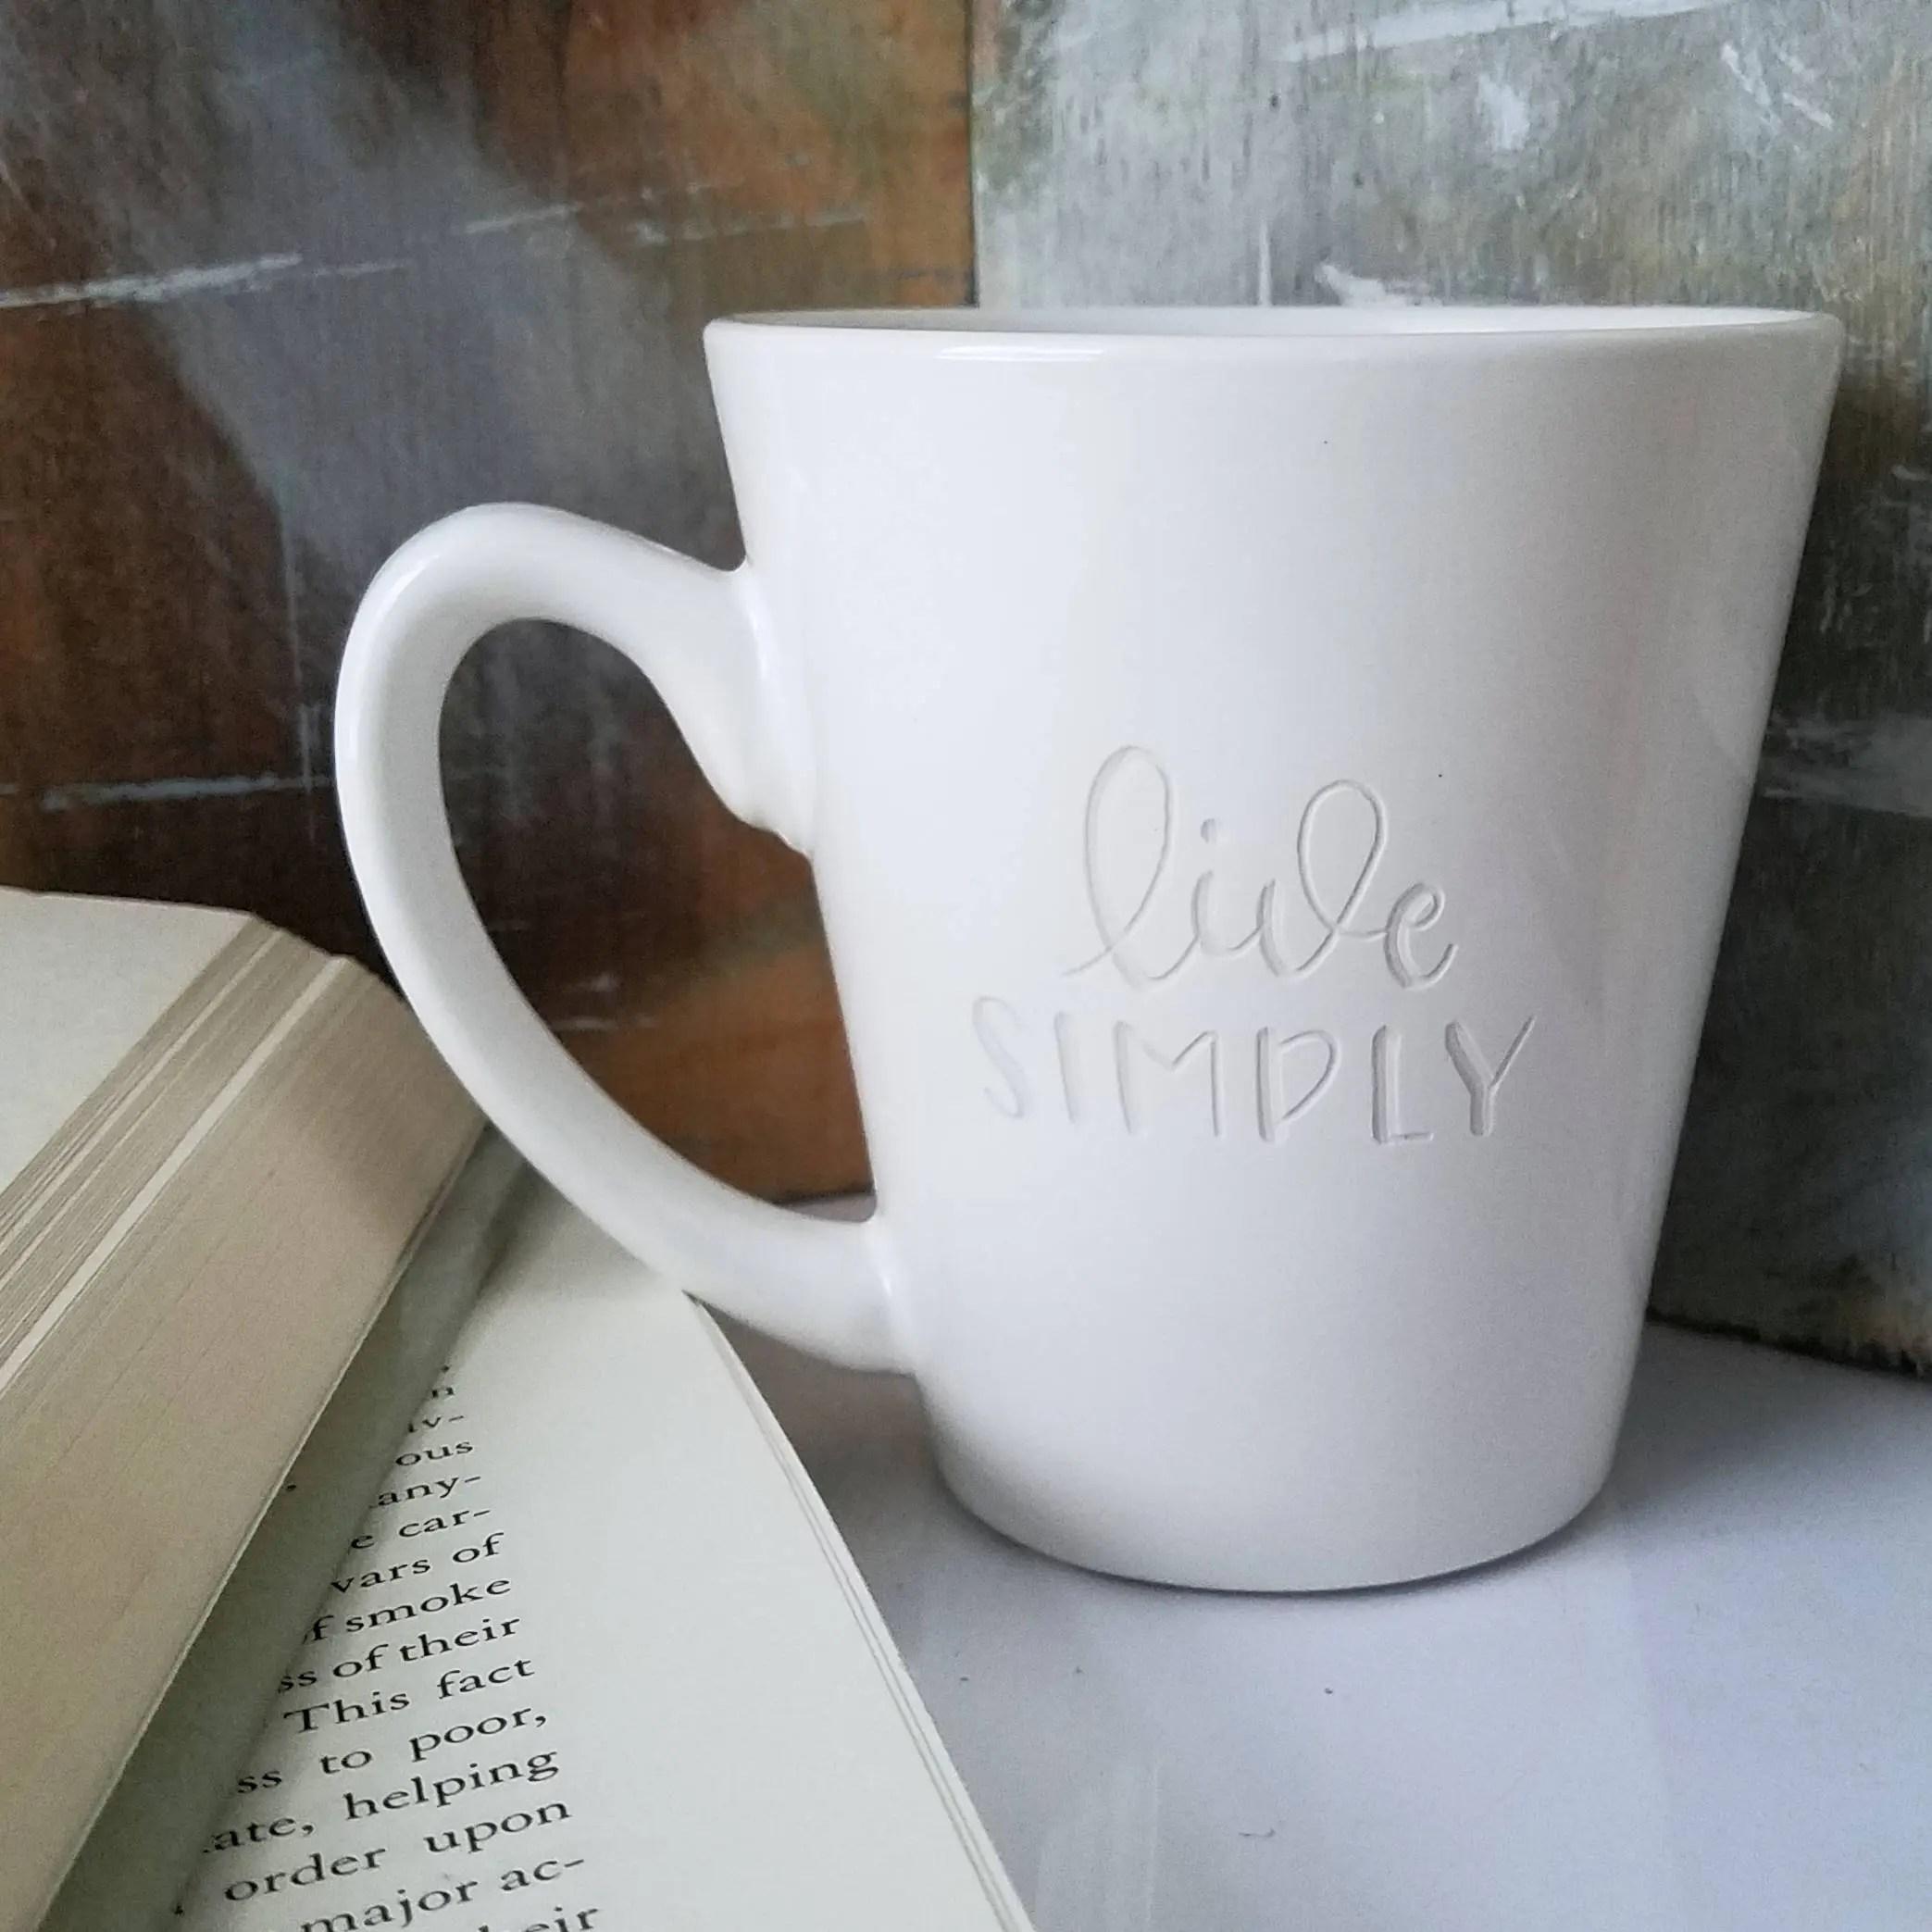 live simply engraved mugs